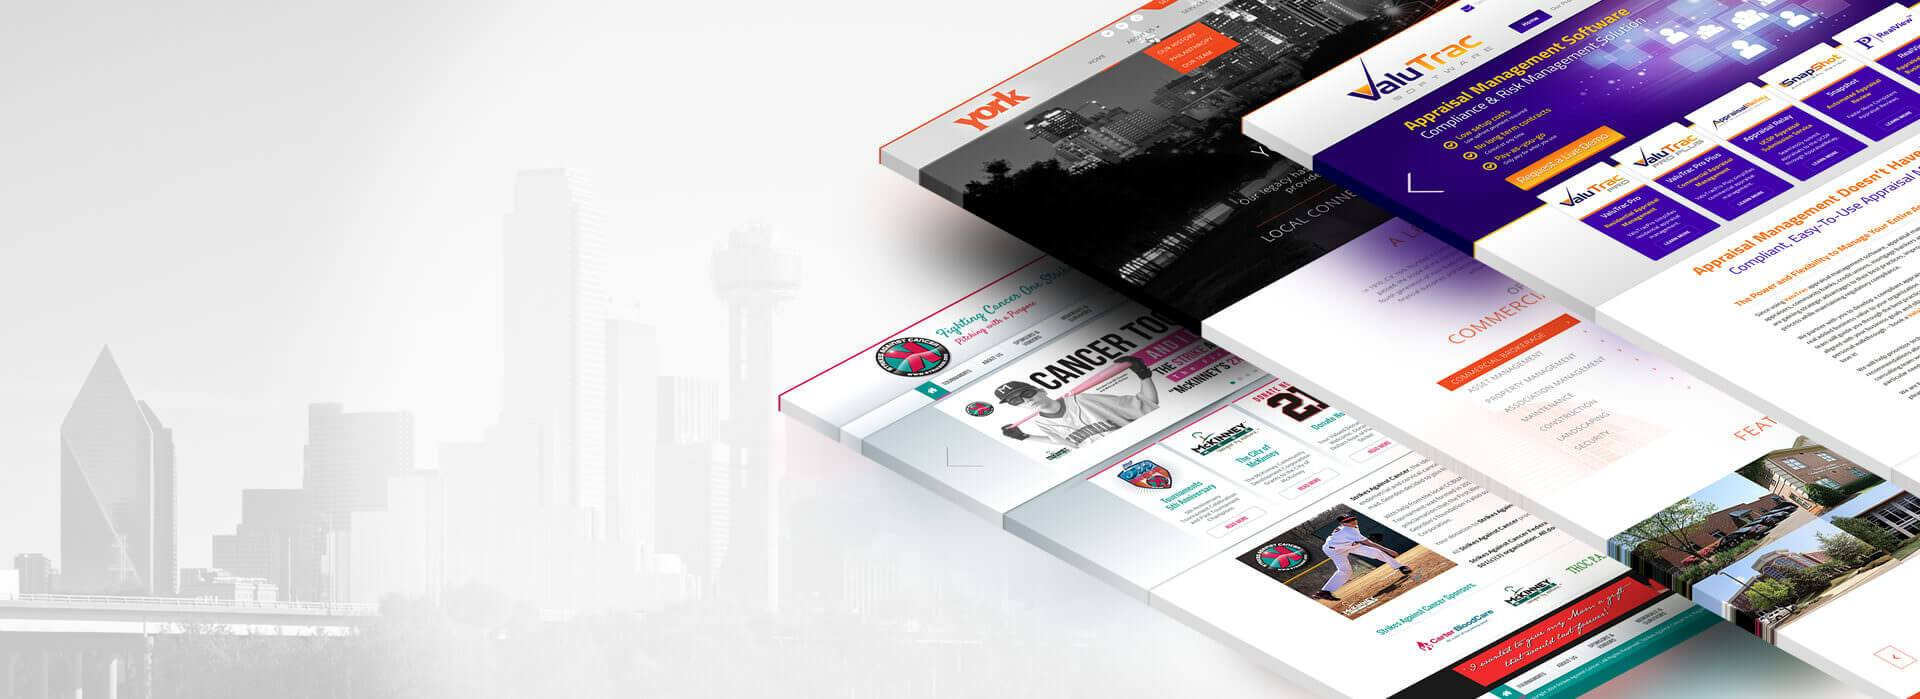 responsive-web-design-dallas.jpg